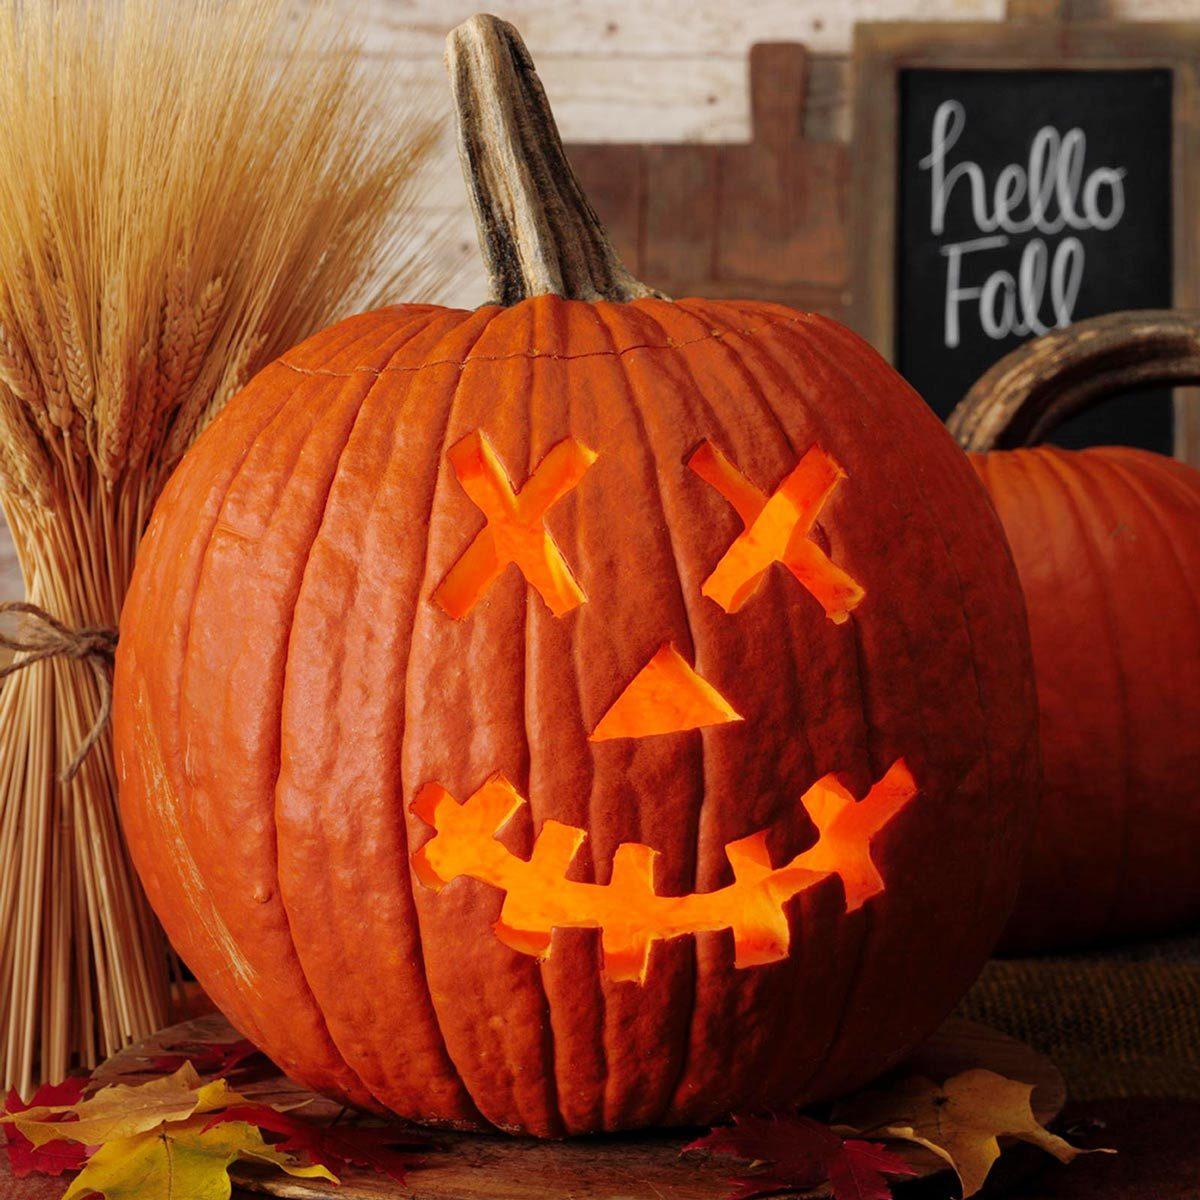 skeleton halloween jack o'lantern pumpkin